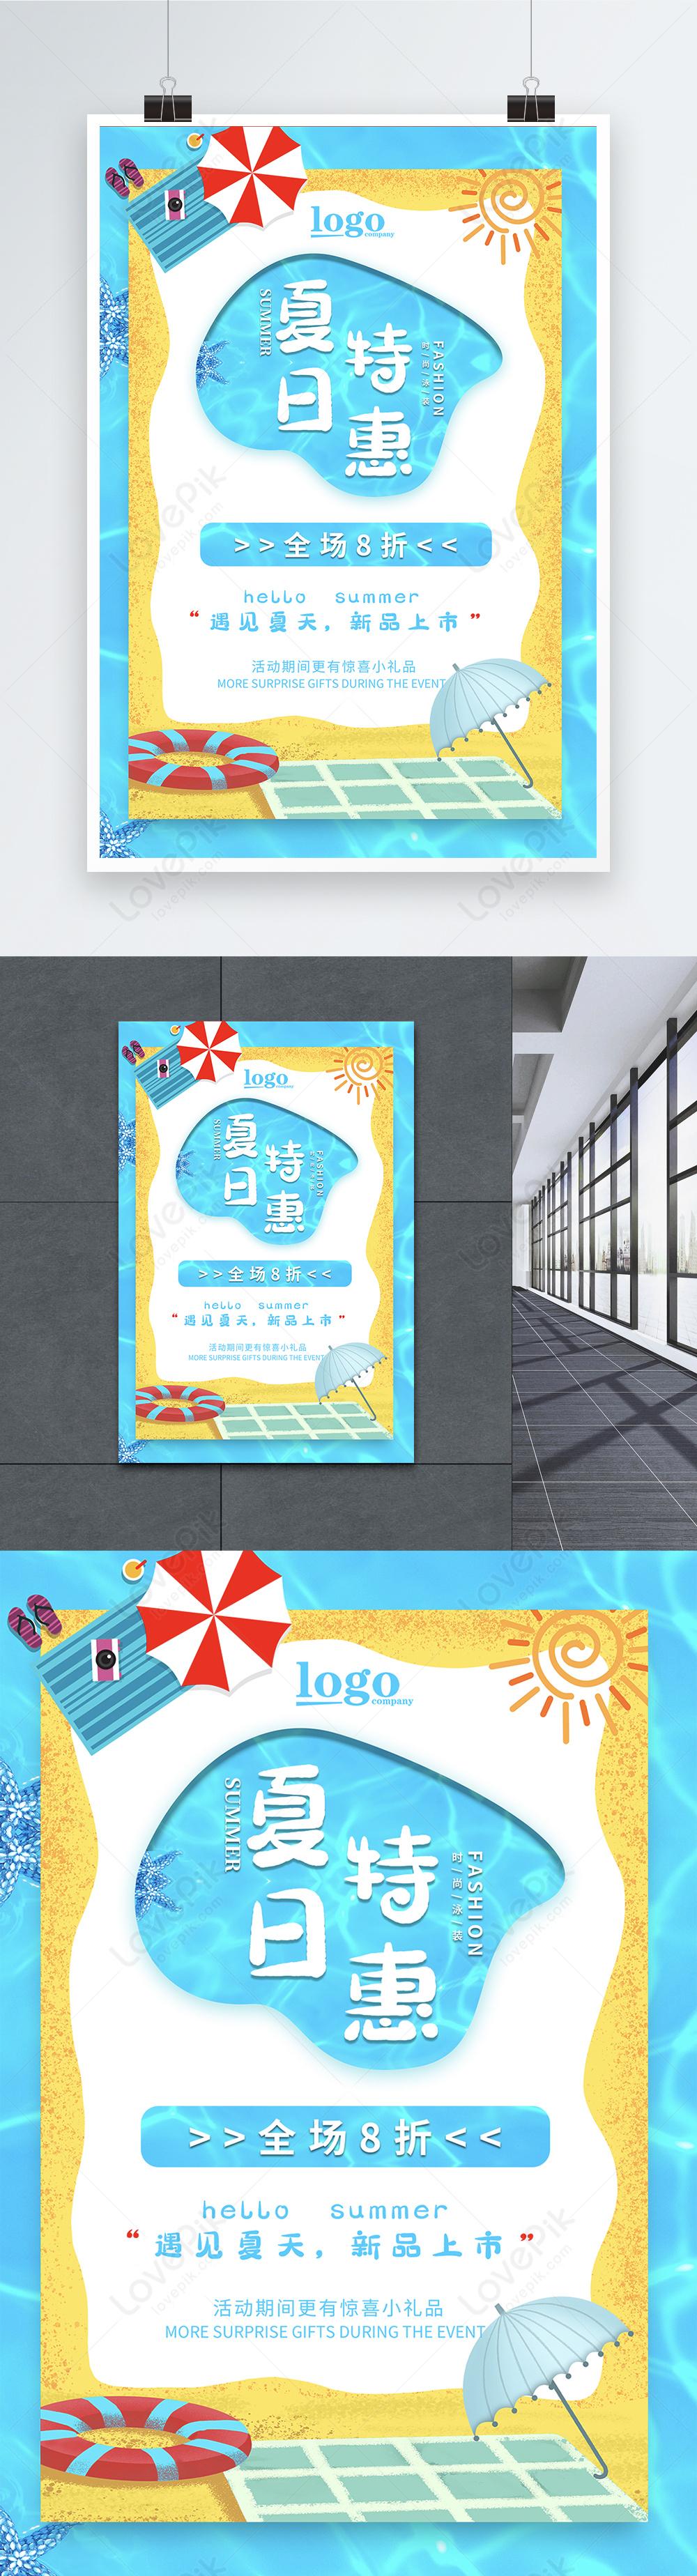 Desain Poster Promosi Baju Renang Musim Panas Yang Keren Gambar Unduh Gratis Templat 401510279 Format Gambar Psd Lovepik Com